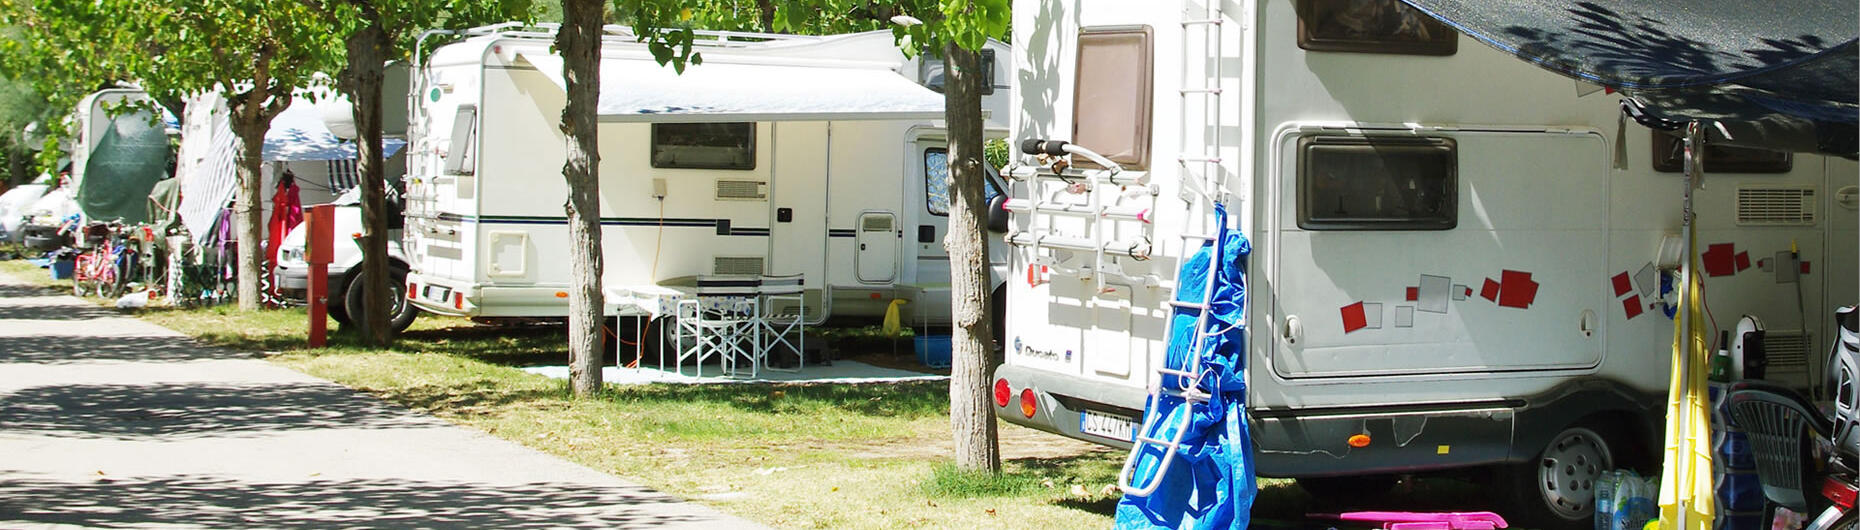 vacanzespinnaker de campingplatze-in-den-marken 005